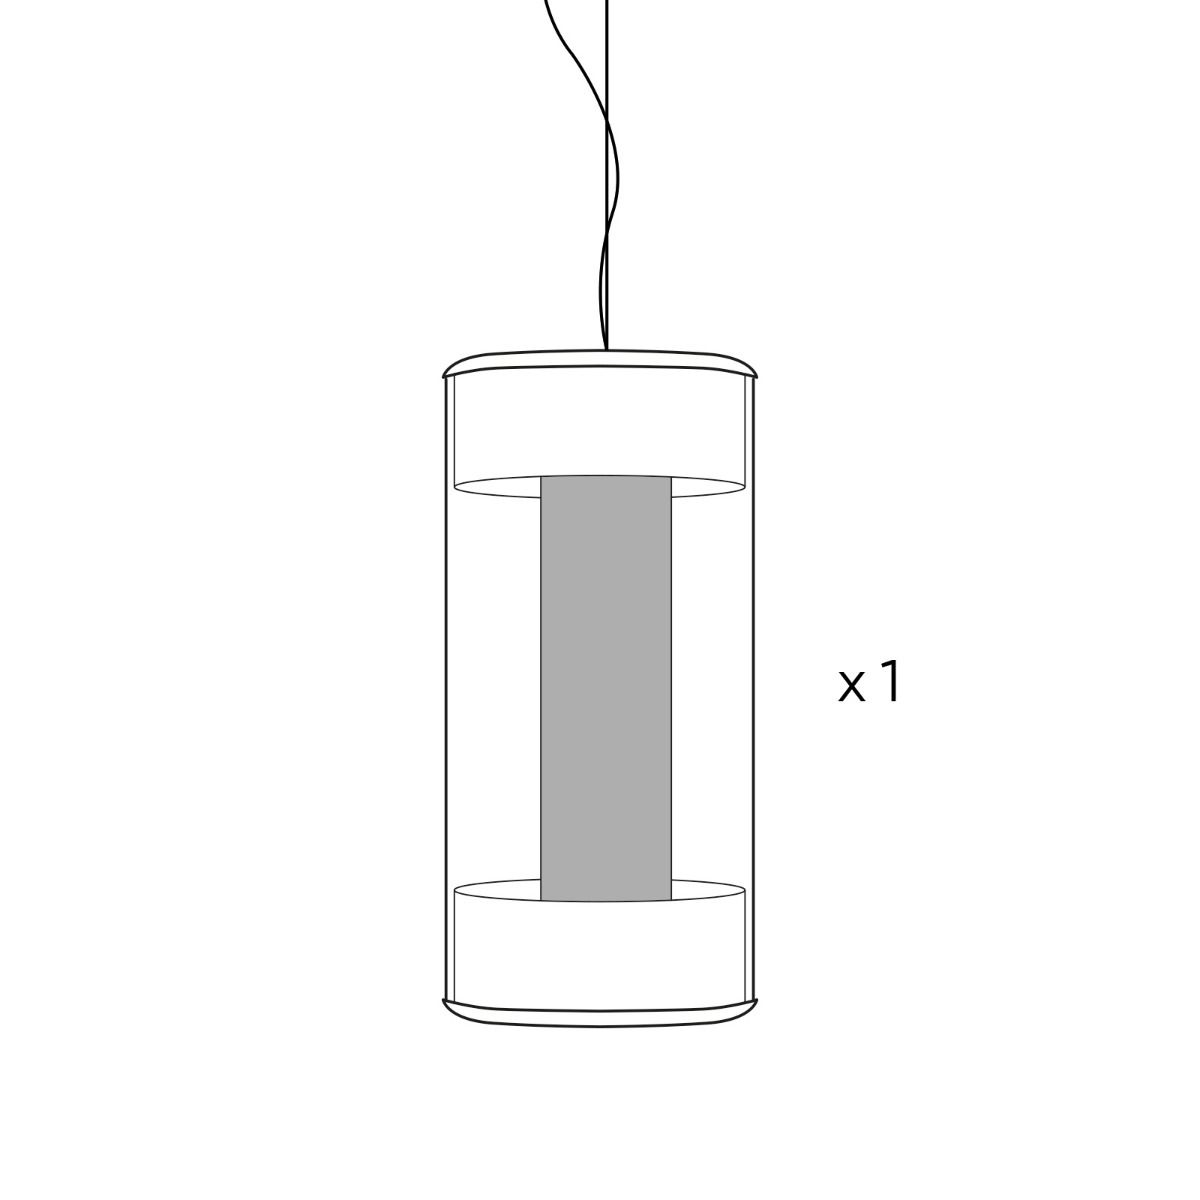 REPUESTOS | GEMINIC & PANBAT Tulipa interior cristal blanco (RGEMPAN-TI)